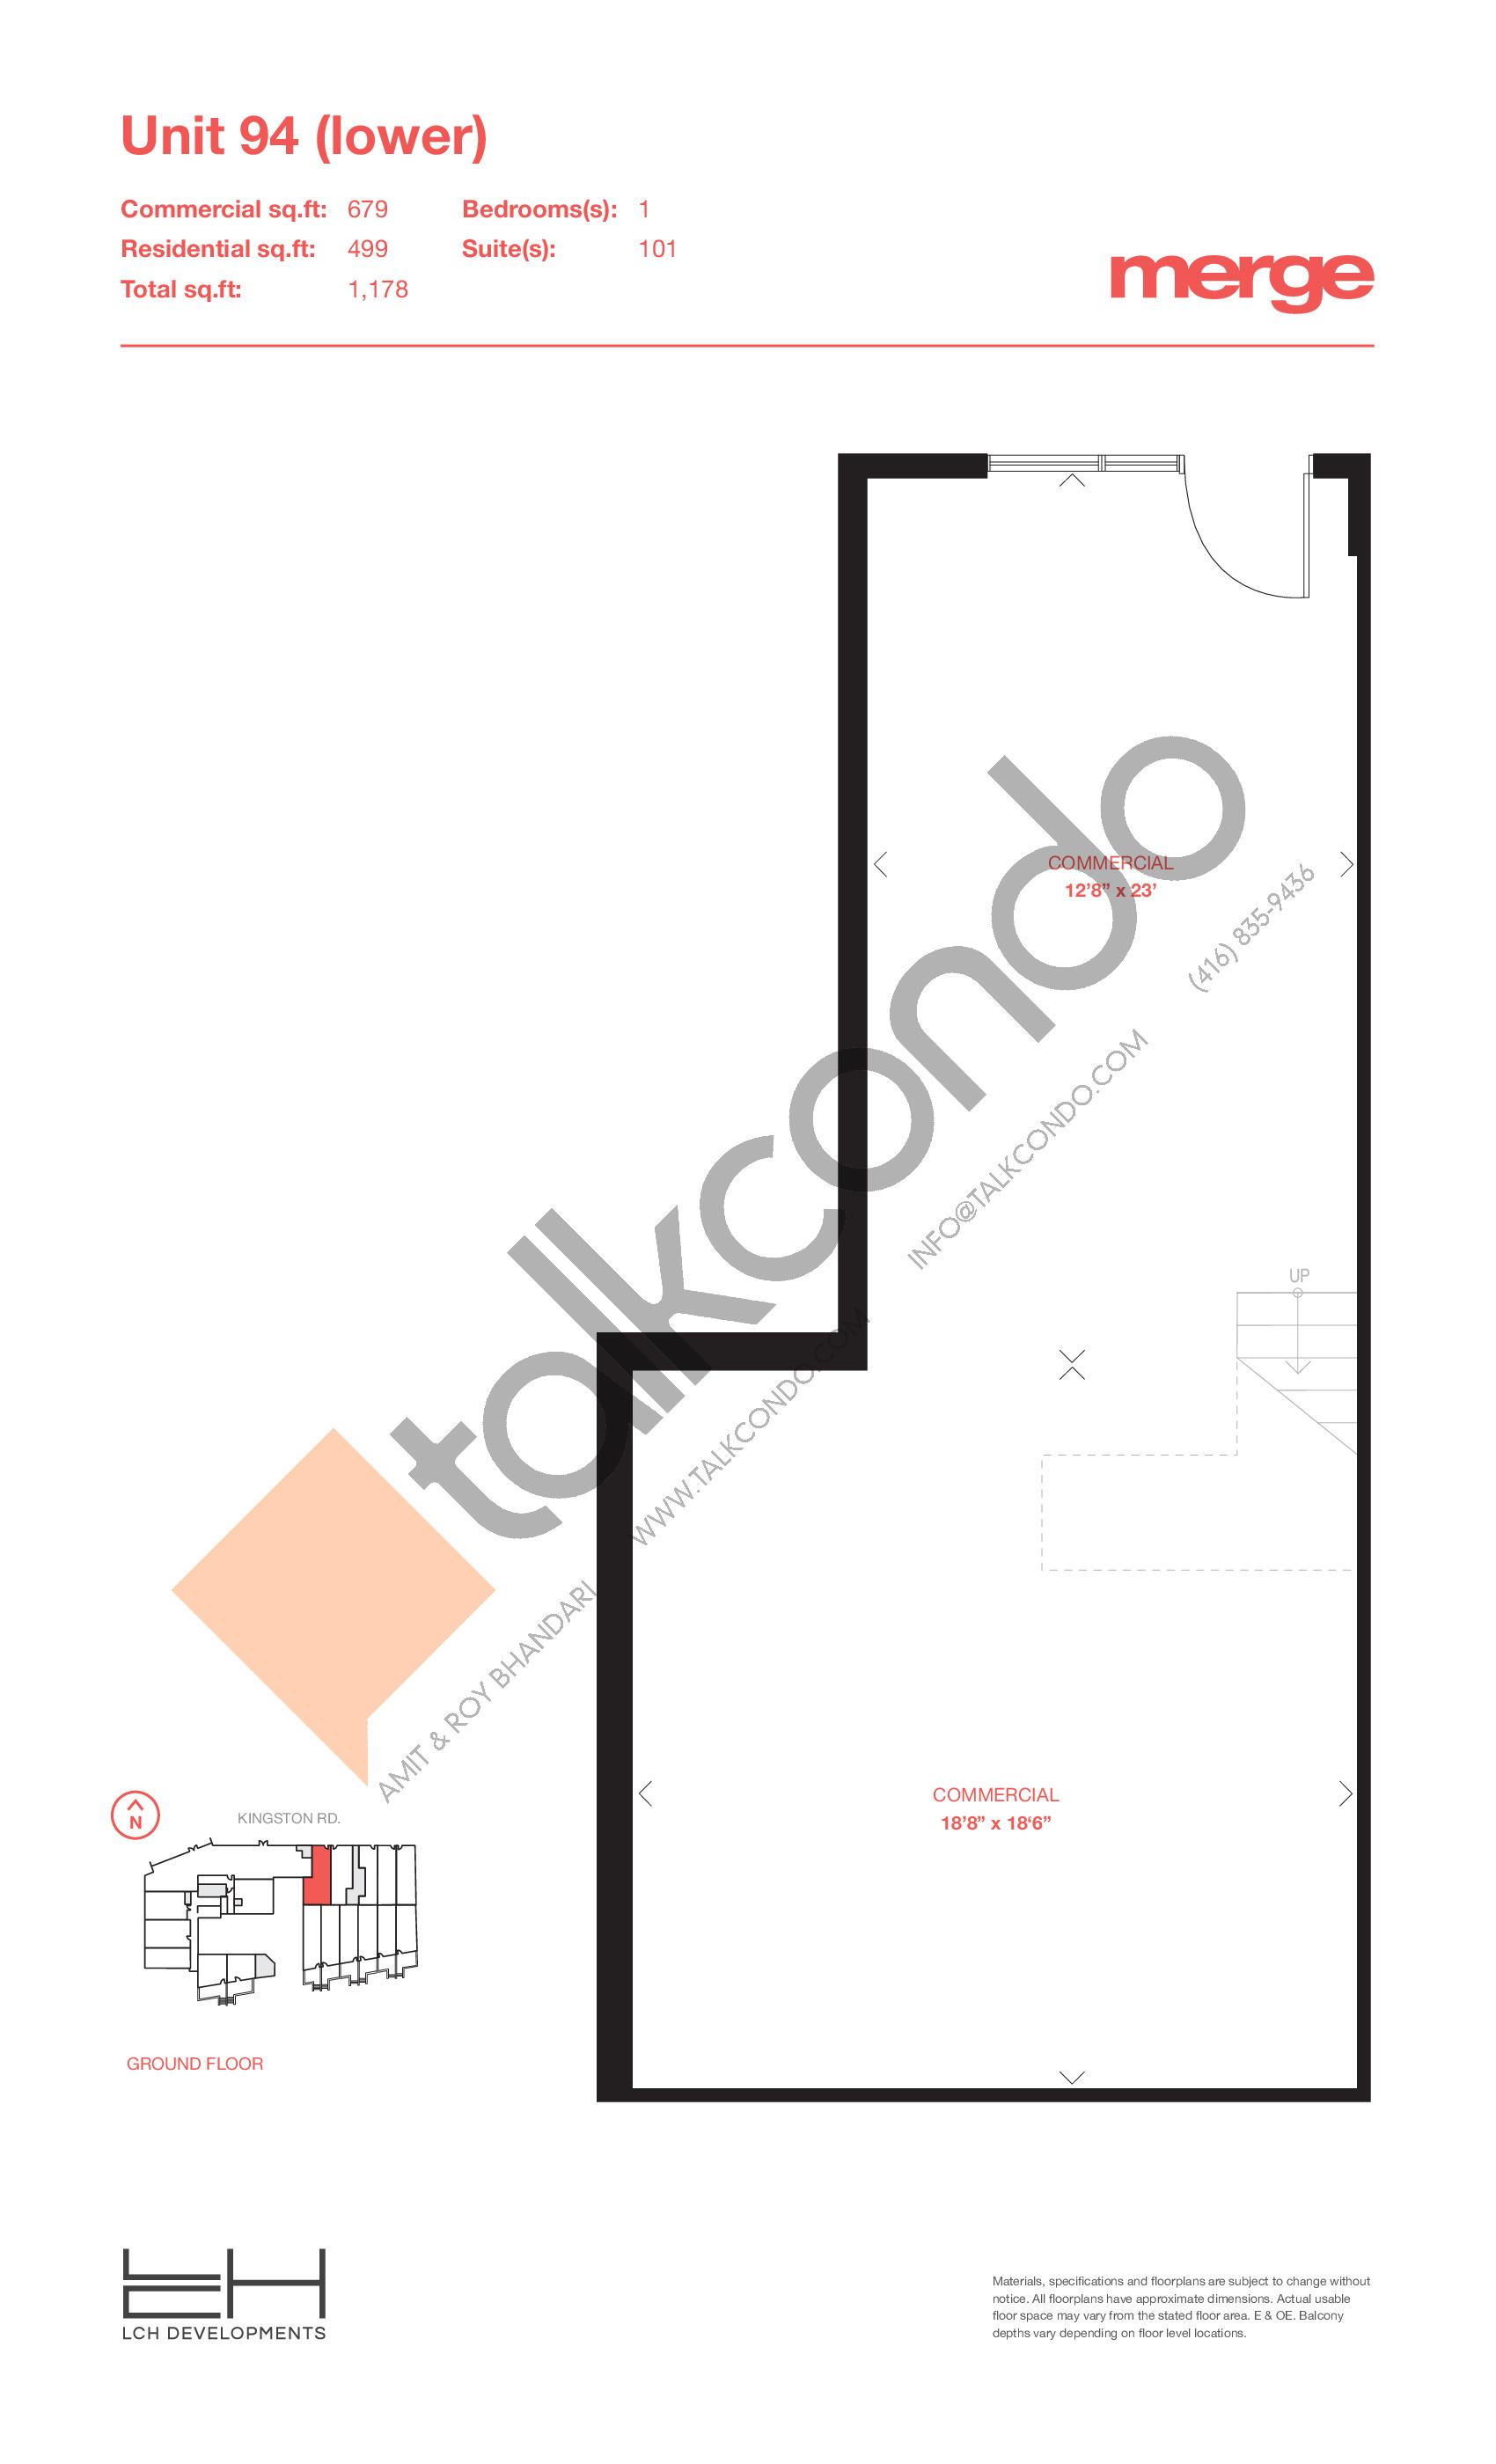 Unit 94 (Lower) - Livework Floor Plan at Merge Condos - 1178 sq.ft